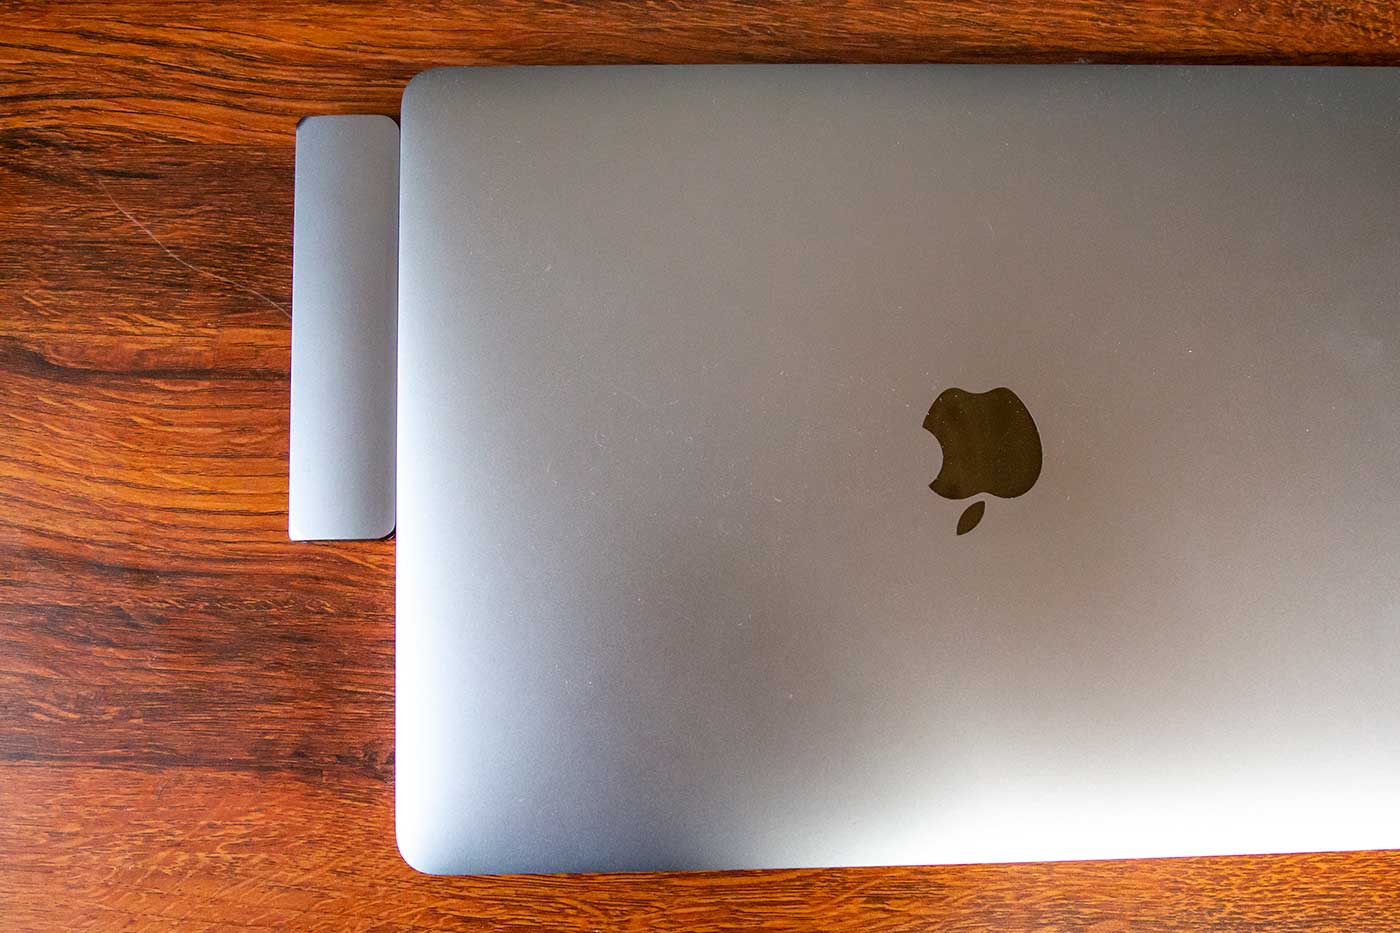 USB-Cハブを接続したMacBookPro